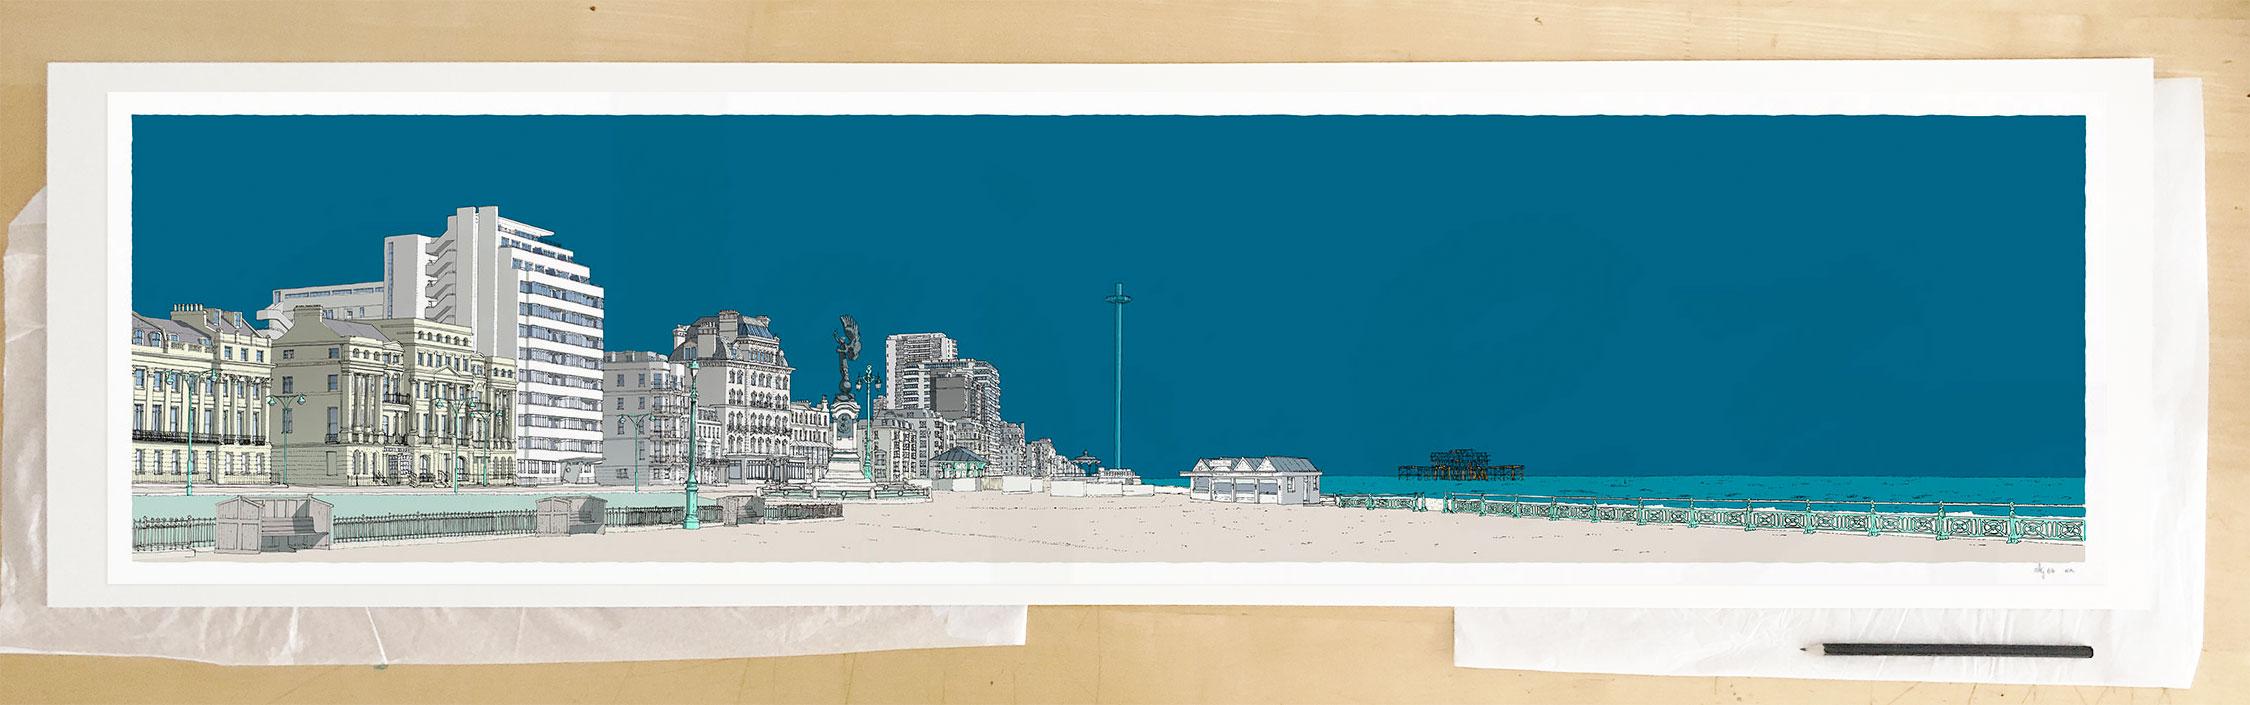 Fine art print by UK artist alej ez titled Embassy Court Brighton and Hove Promenade Ocean Blue